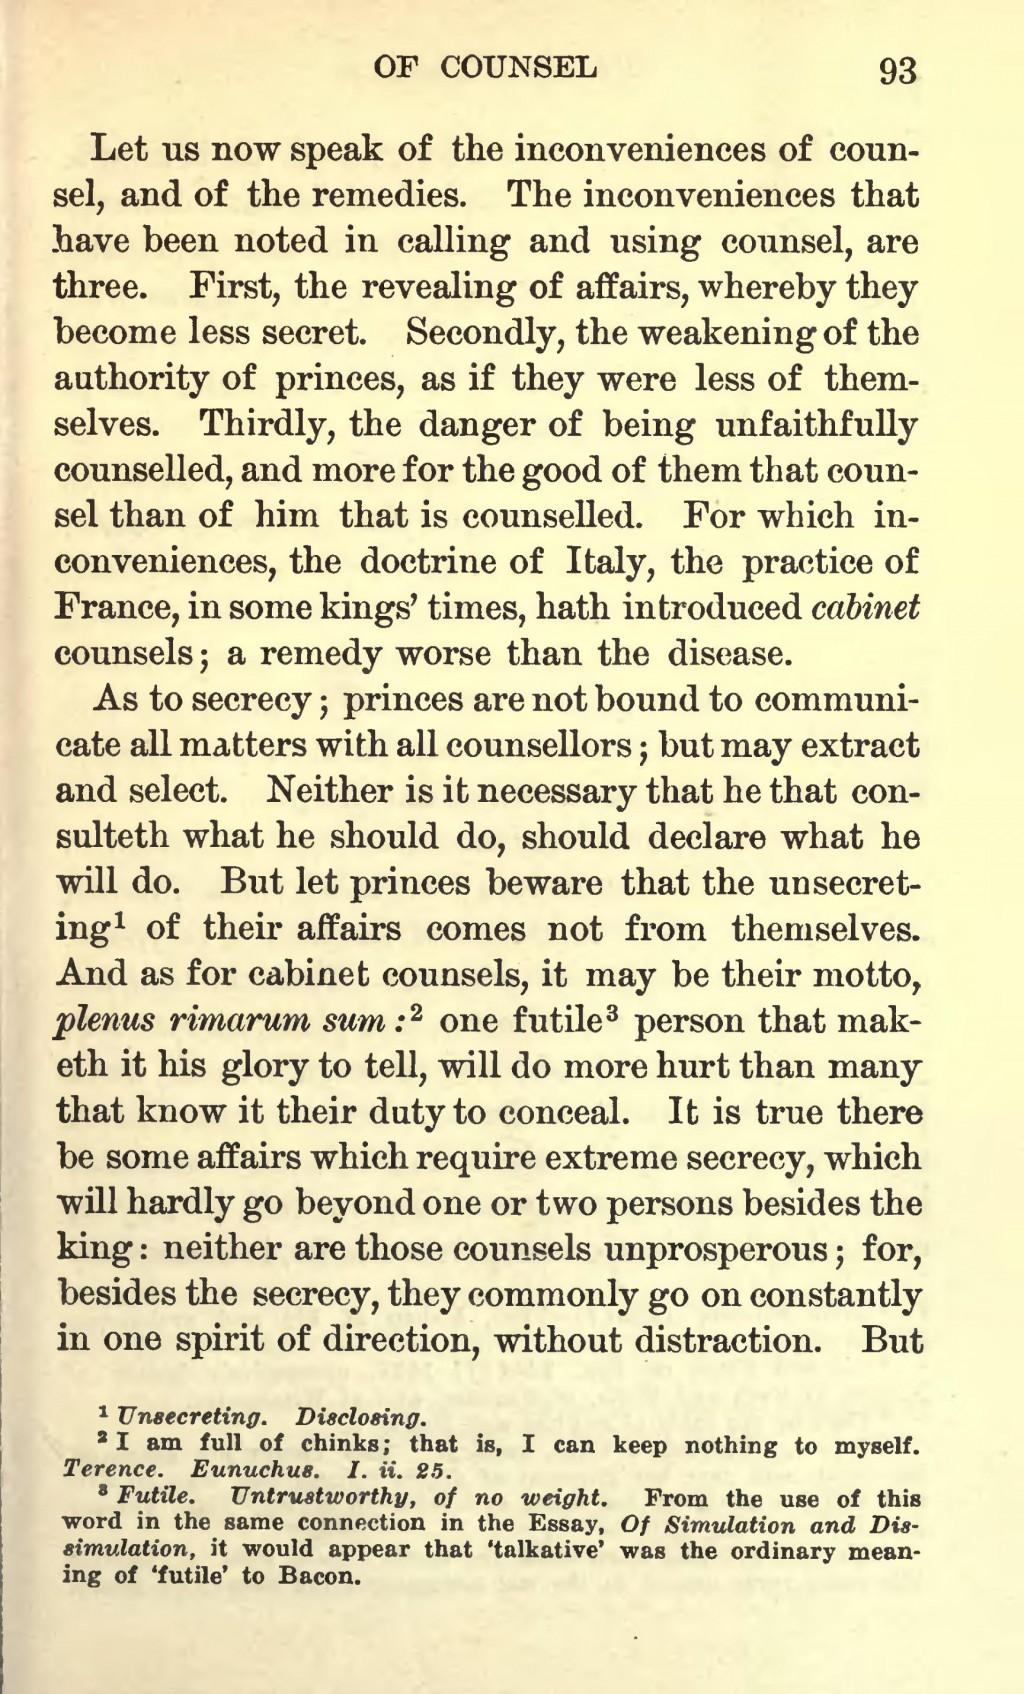 007 Page203 1728px Essays Of Francis Bacon 1908 Scott Djvu Bacons Essay Amazing Google Books Truth Quiz Bacon's Summary Large